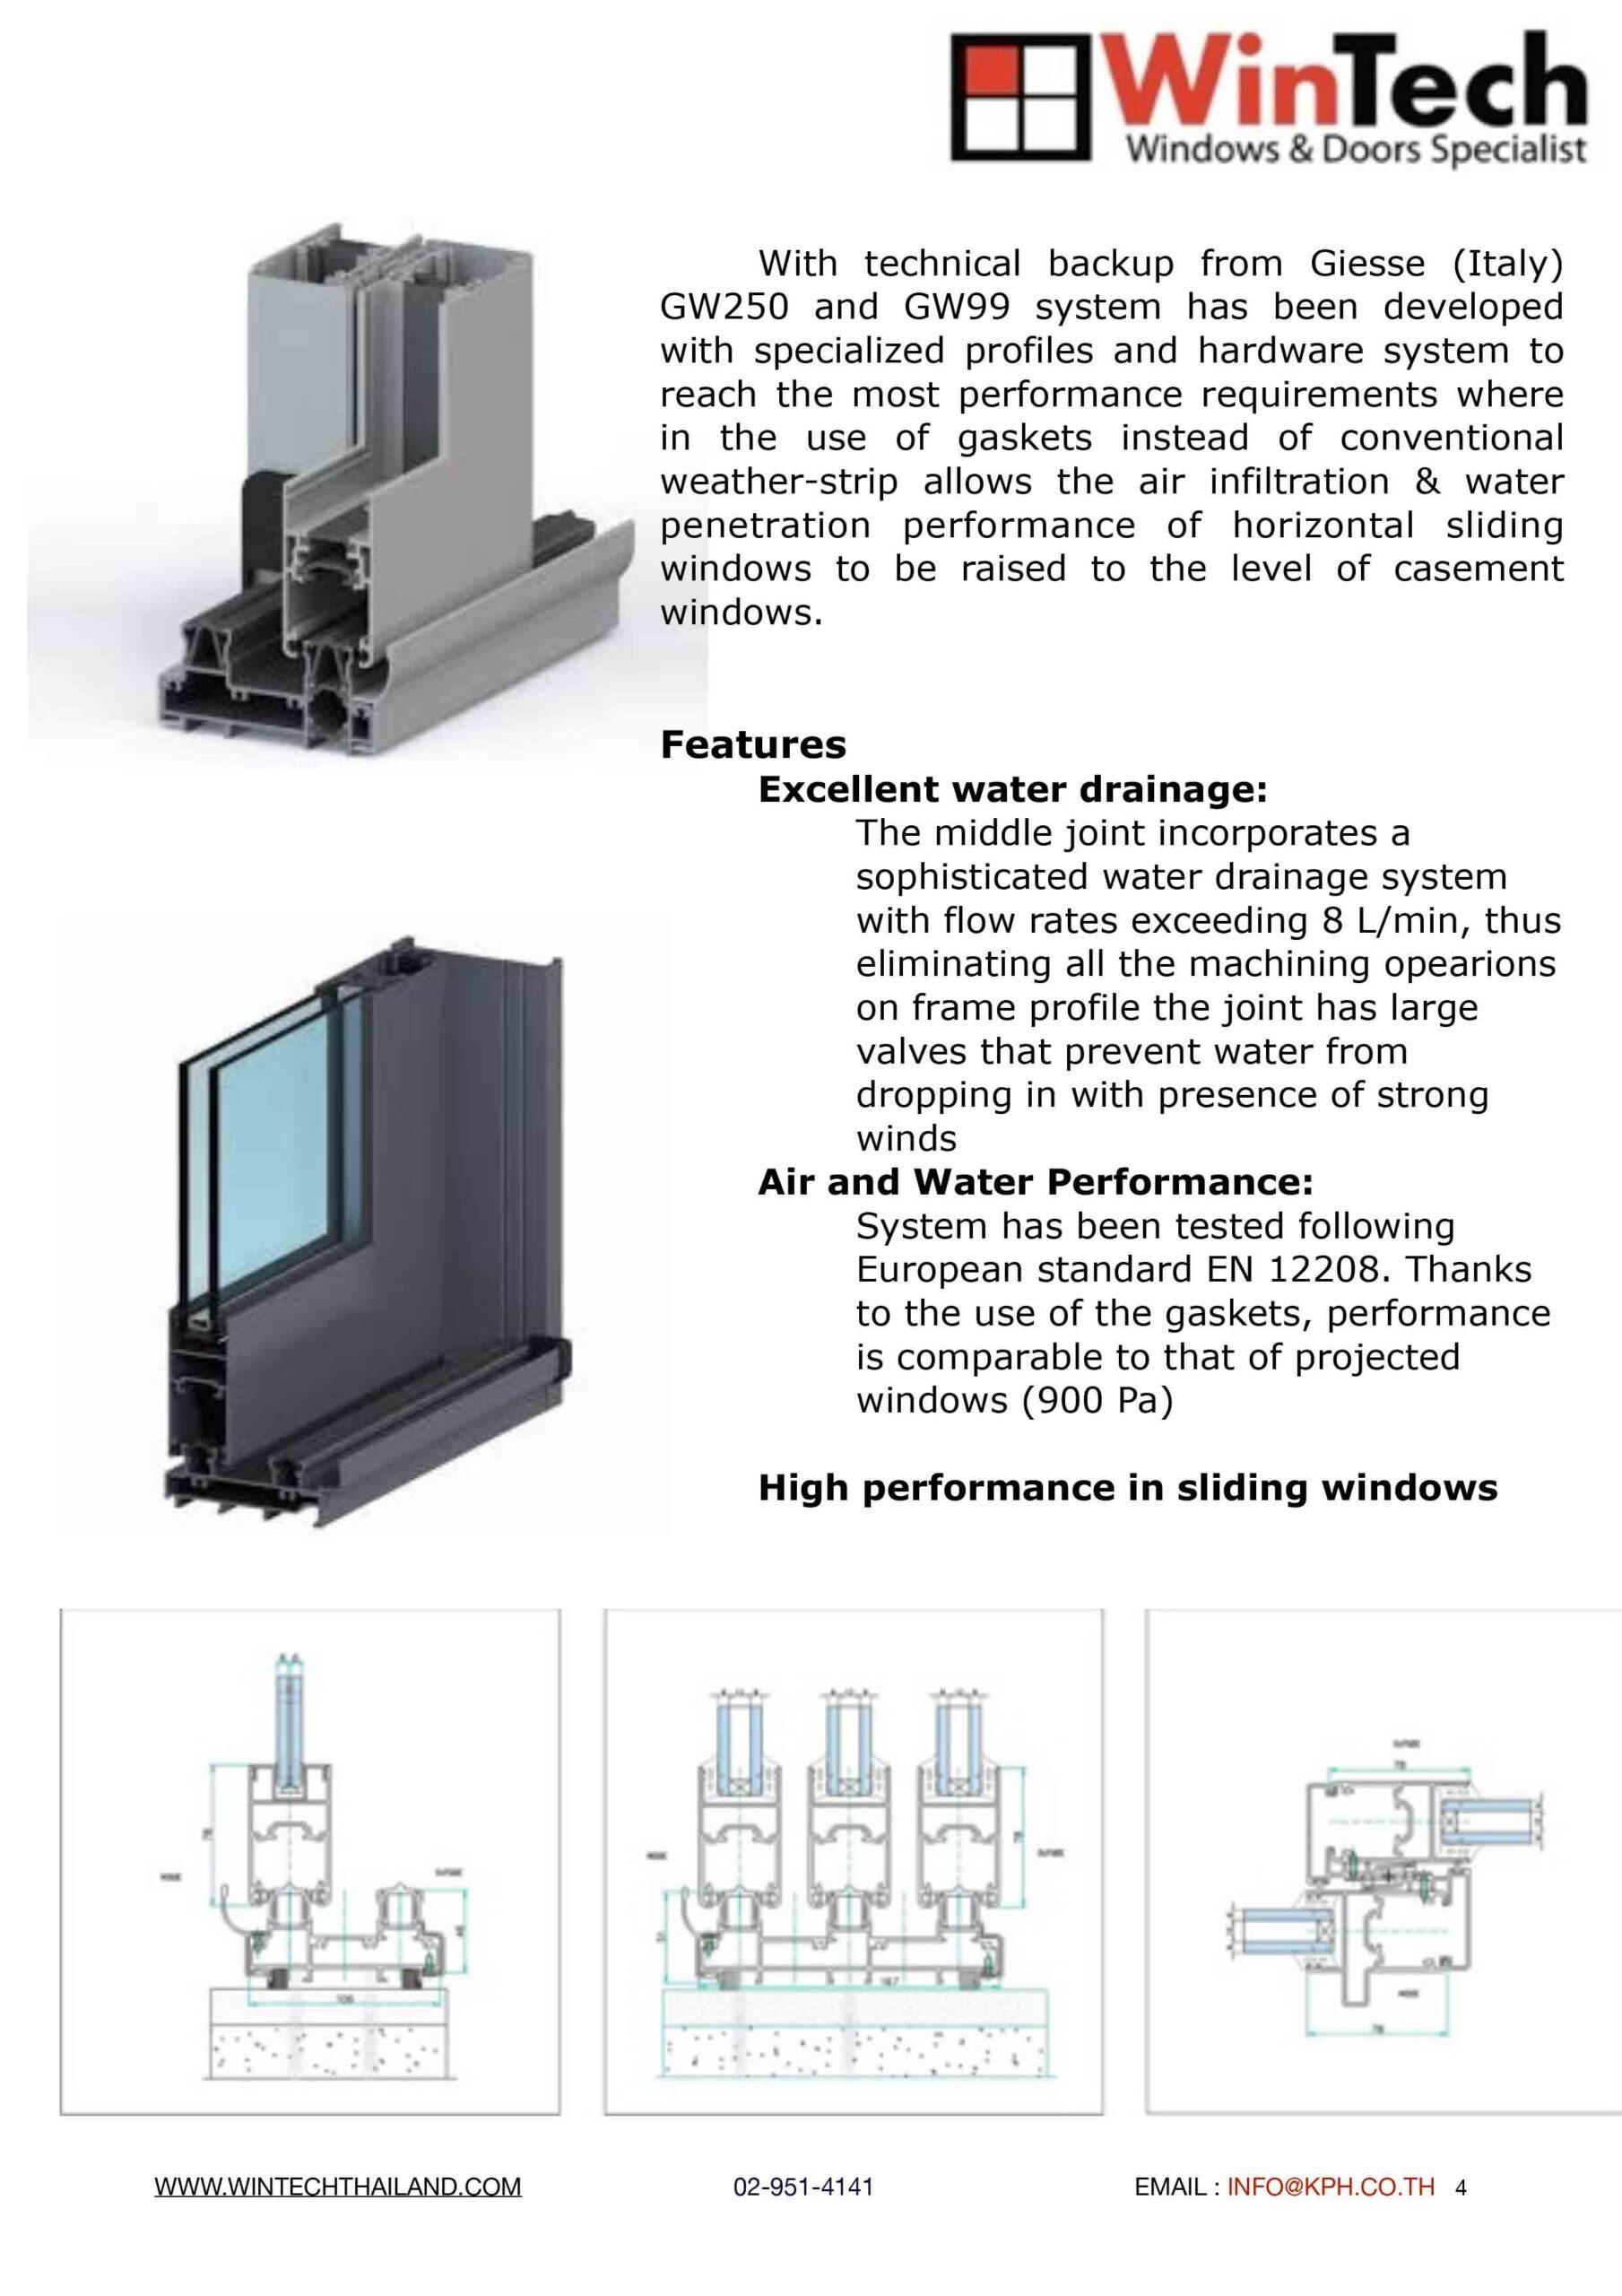 Wintech-Italy-Brochure-commp-4